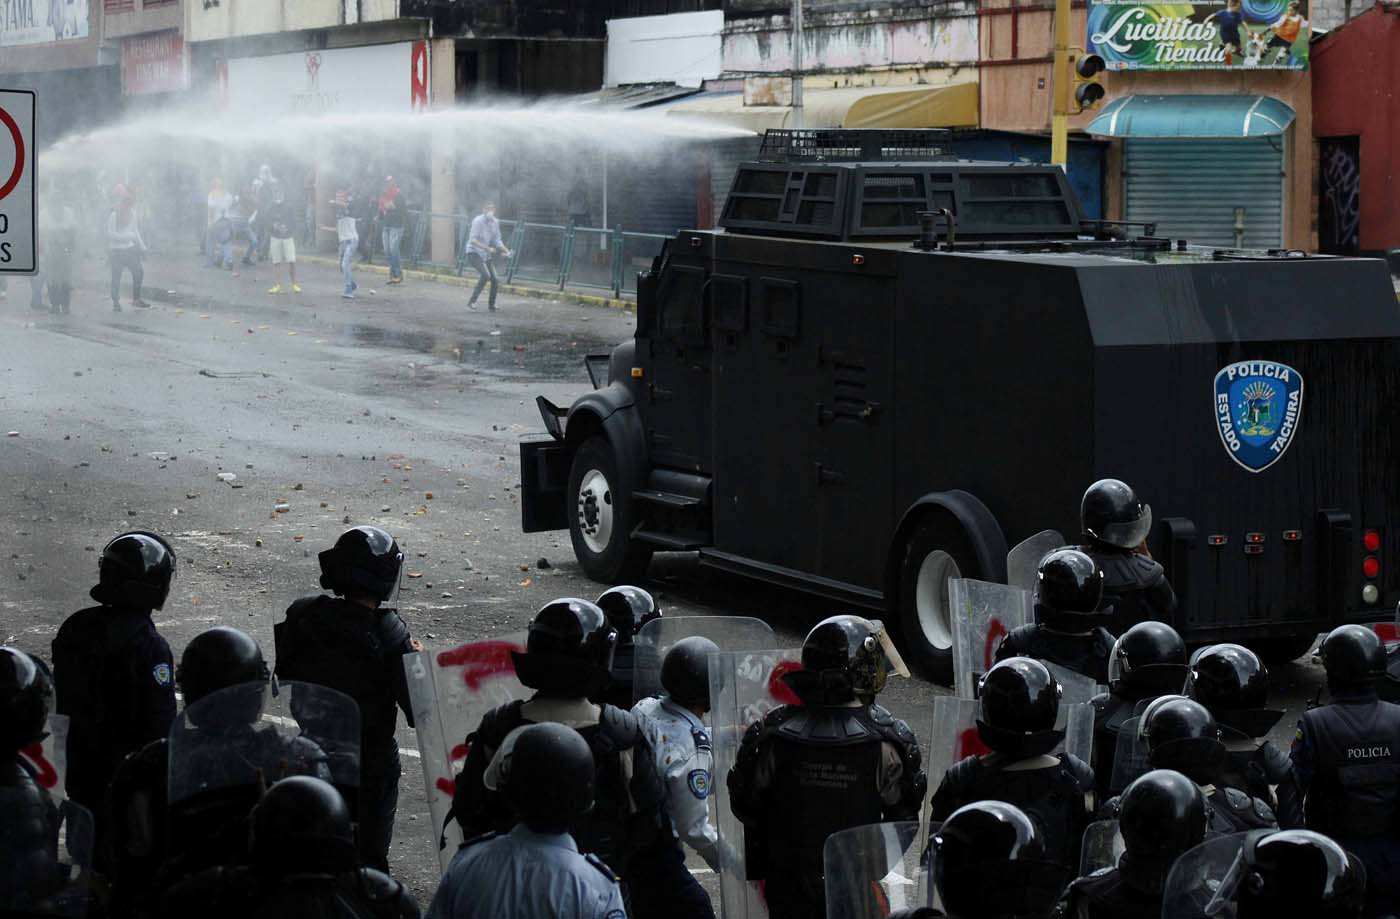 Opposition supporters clash with police during protests against unpopular leftist President Nicolas Maduro in San Cristobal, Venezuela April 19, 2017. REUTERS/Carlos Eduardo Ramirez